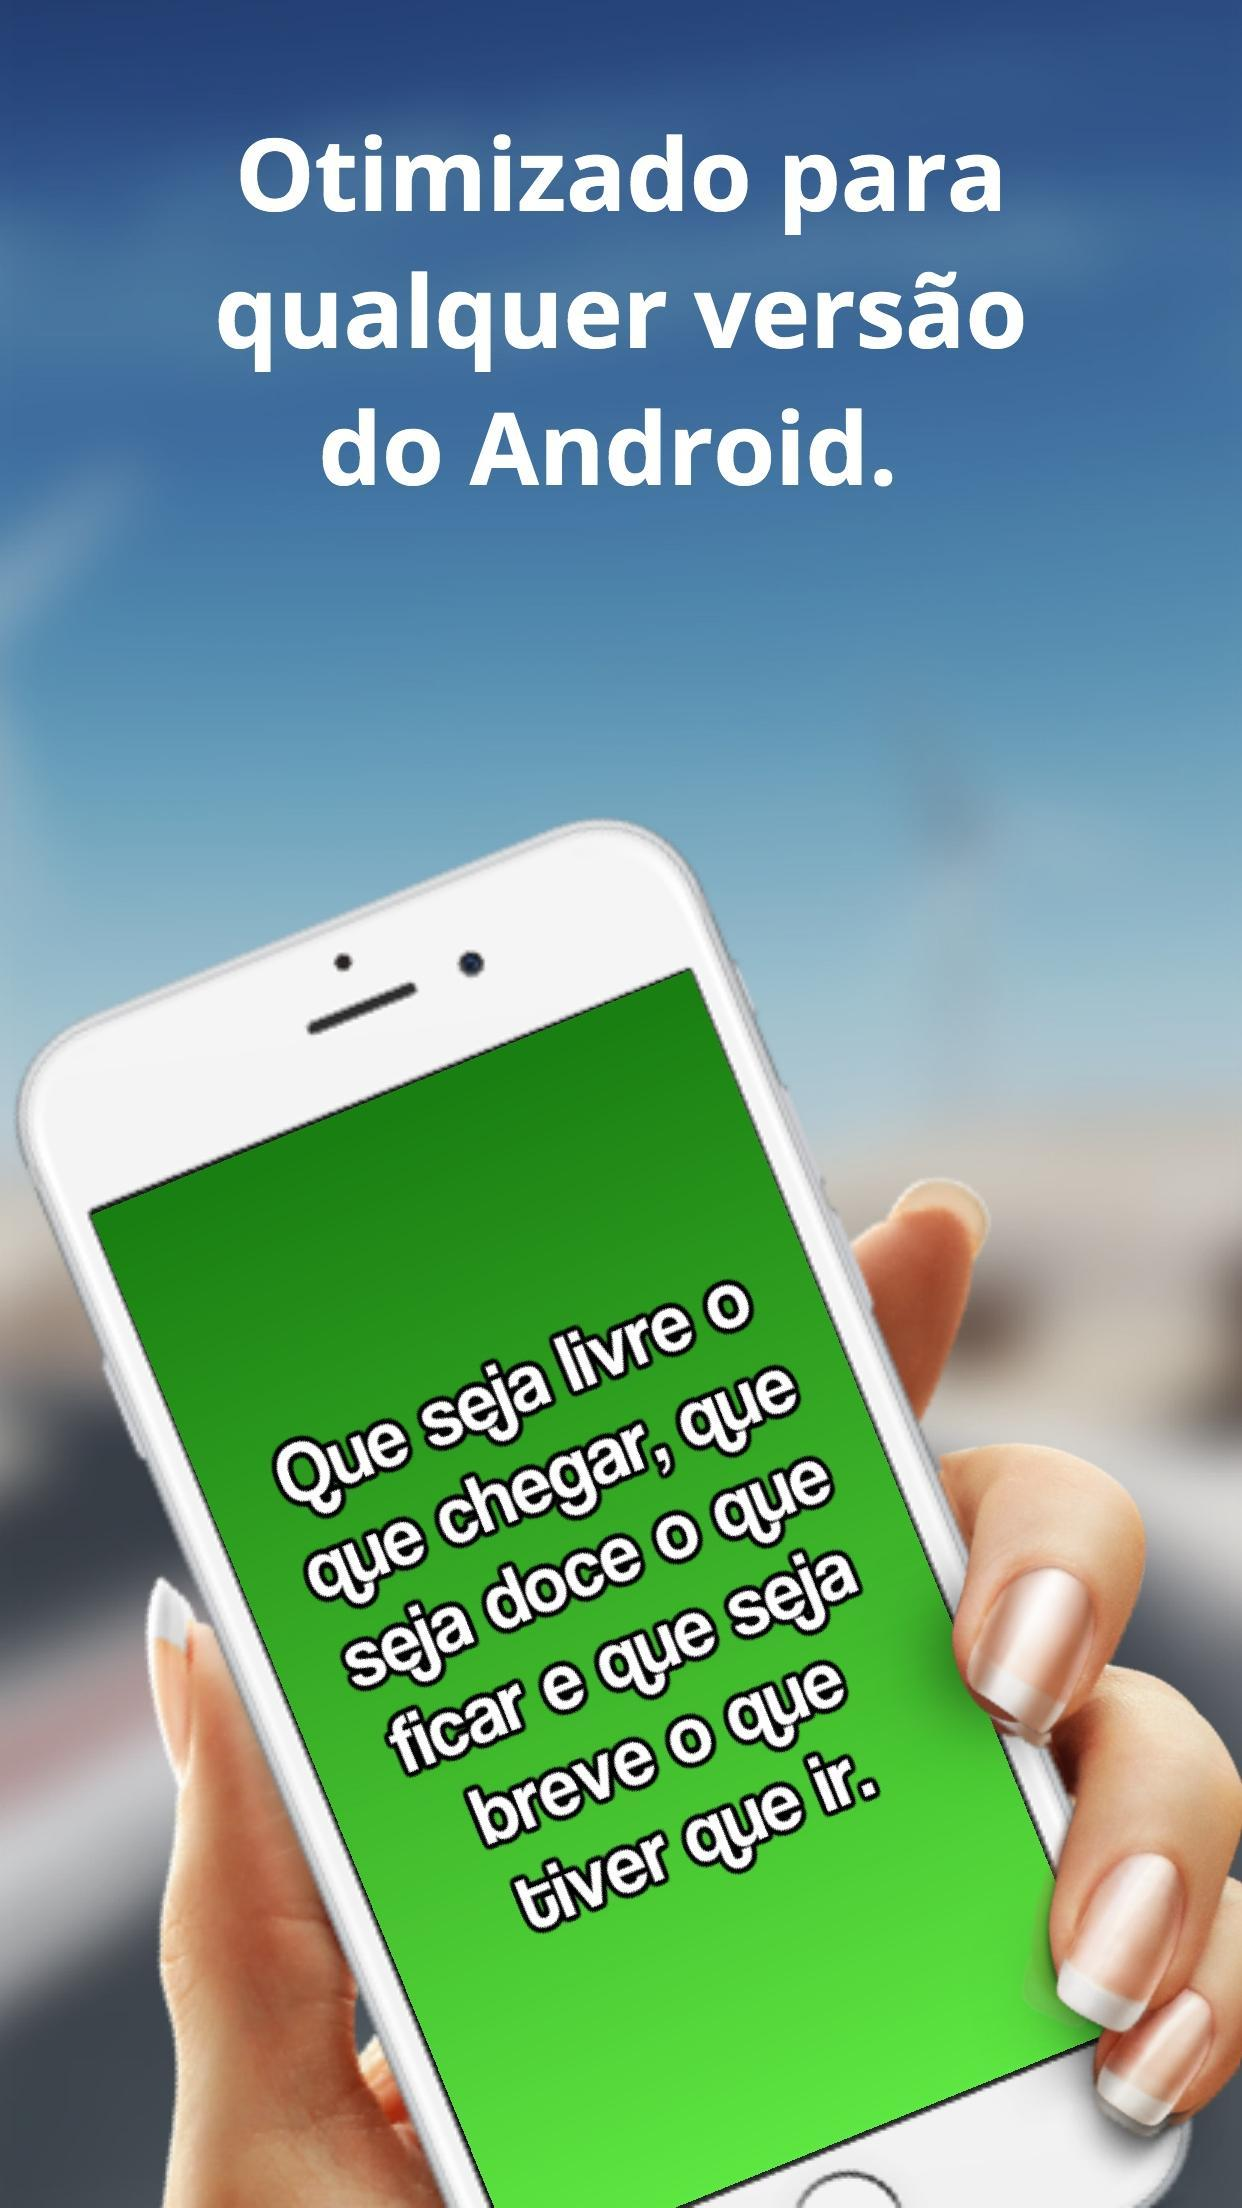 Frases Pensativas For Android Apk Download